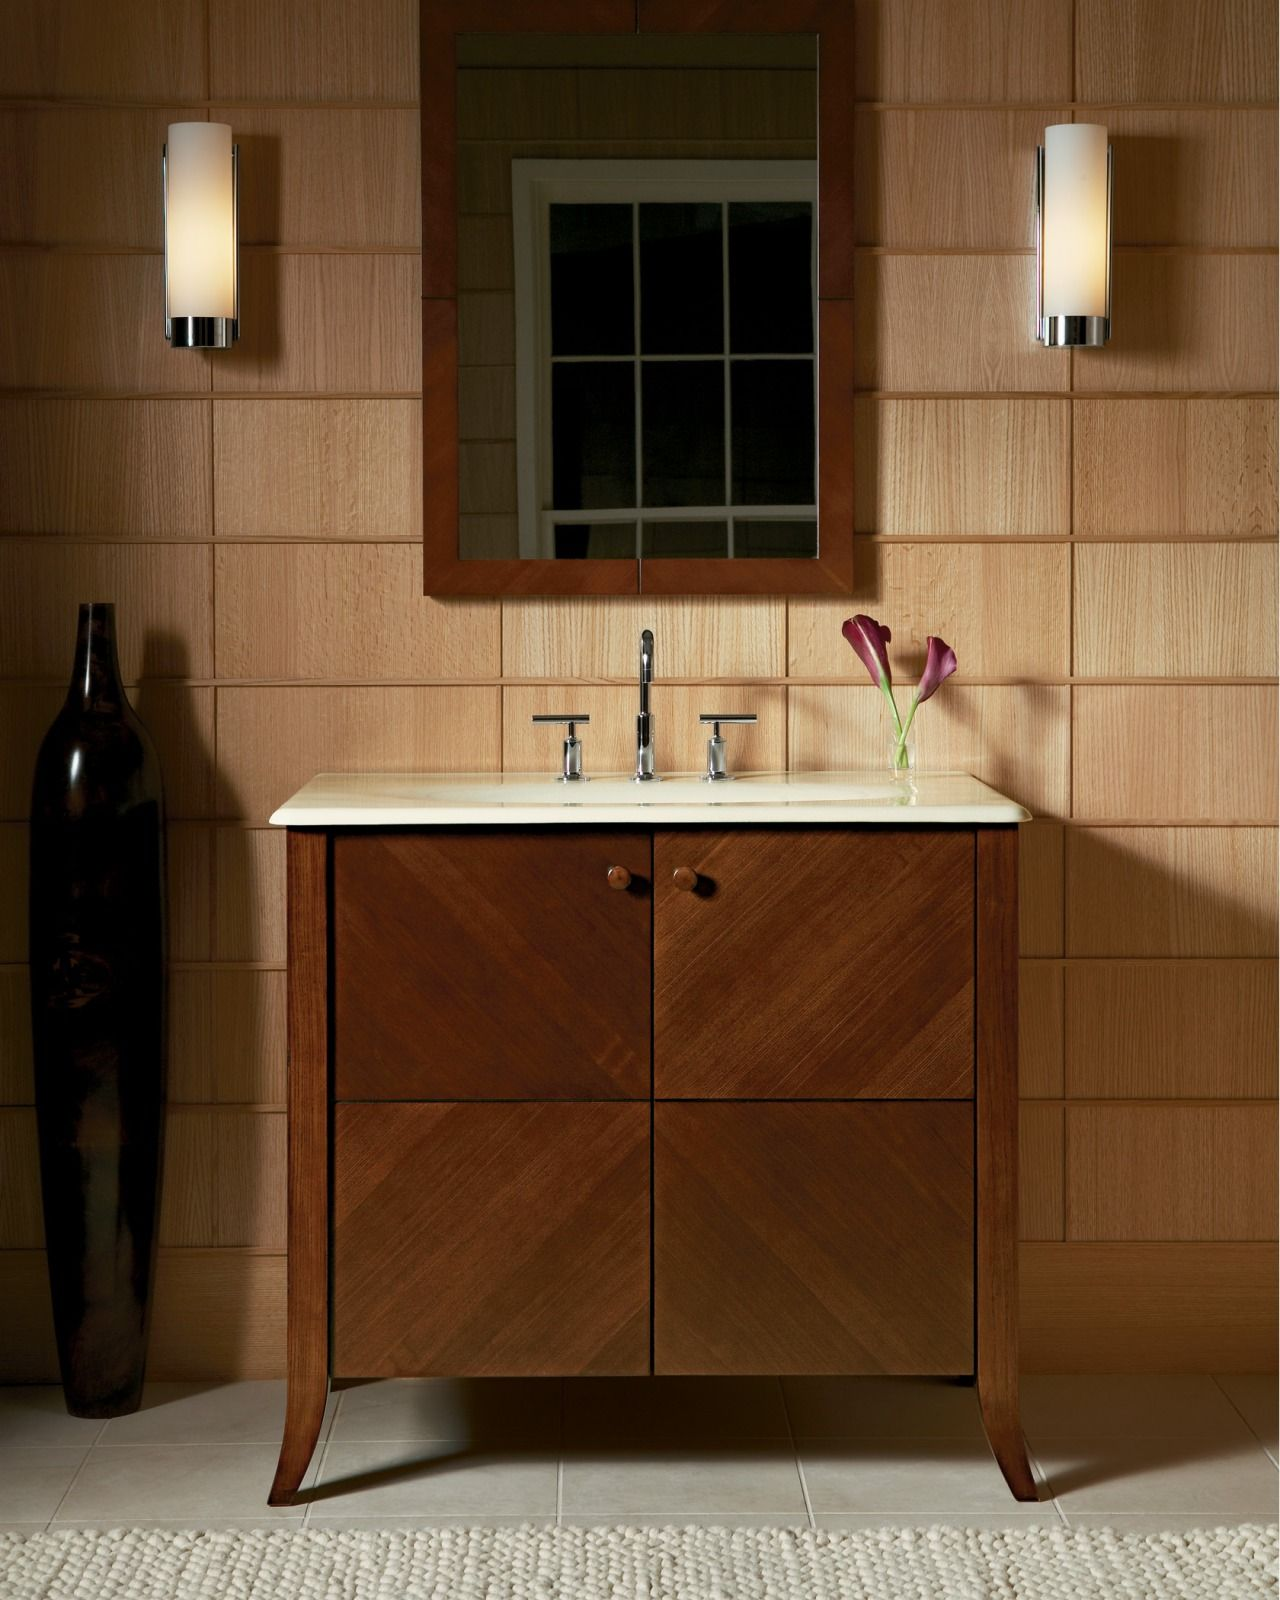 Clermont Vanity Http Www Us Kohler Com Us Vanities Vanity Styles Clermont Brand 430594 1002771 Htm Brandn Bathroom Vanity Contemporary Bathroom Vanity Vanity [ 1600 x 1280 Pixel ]